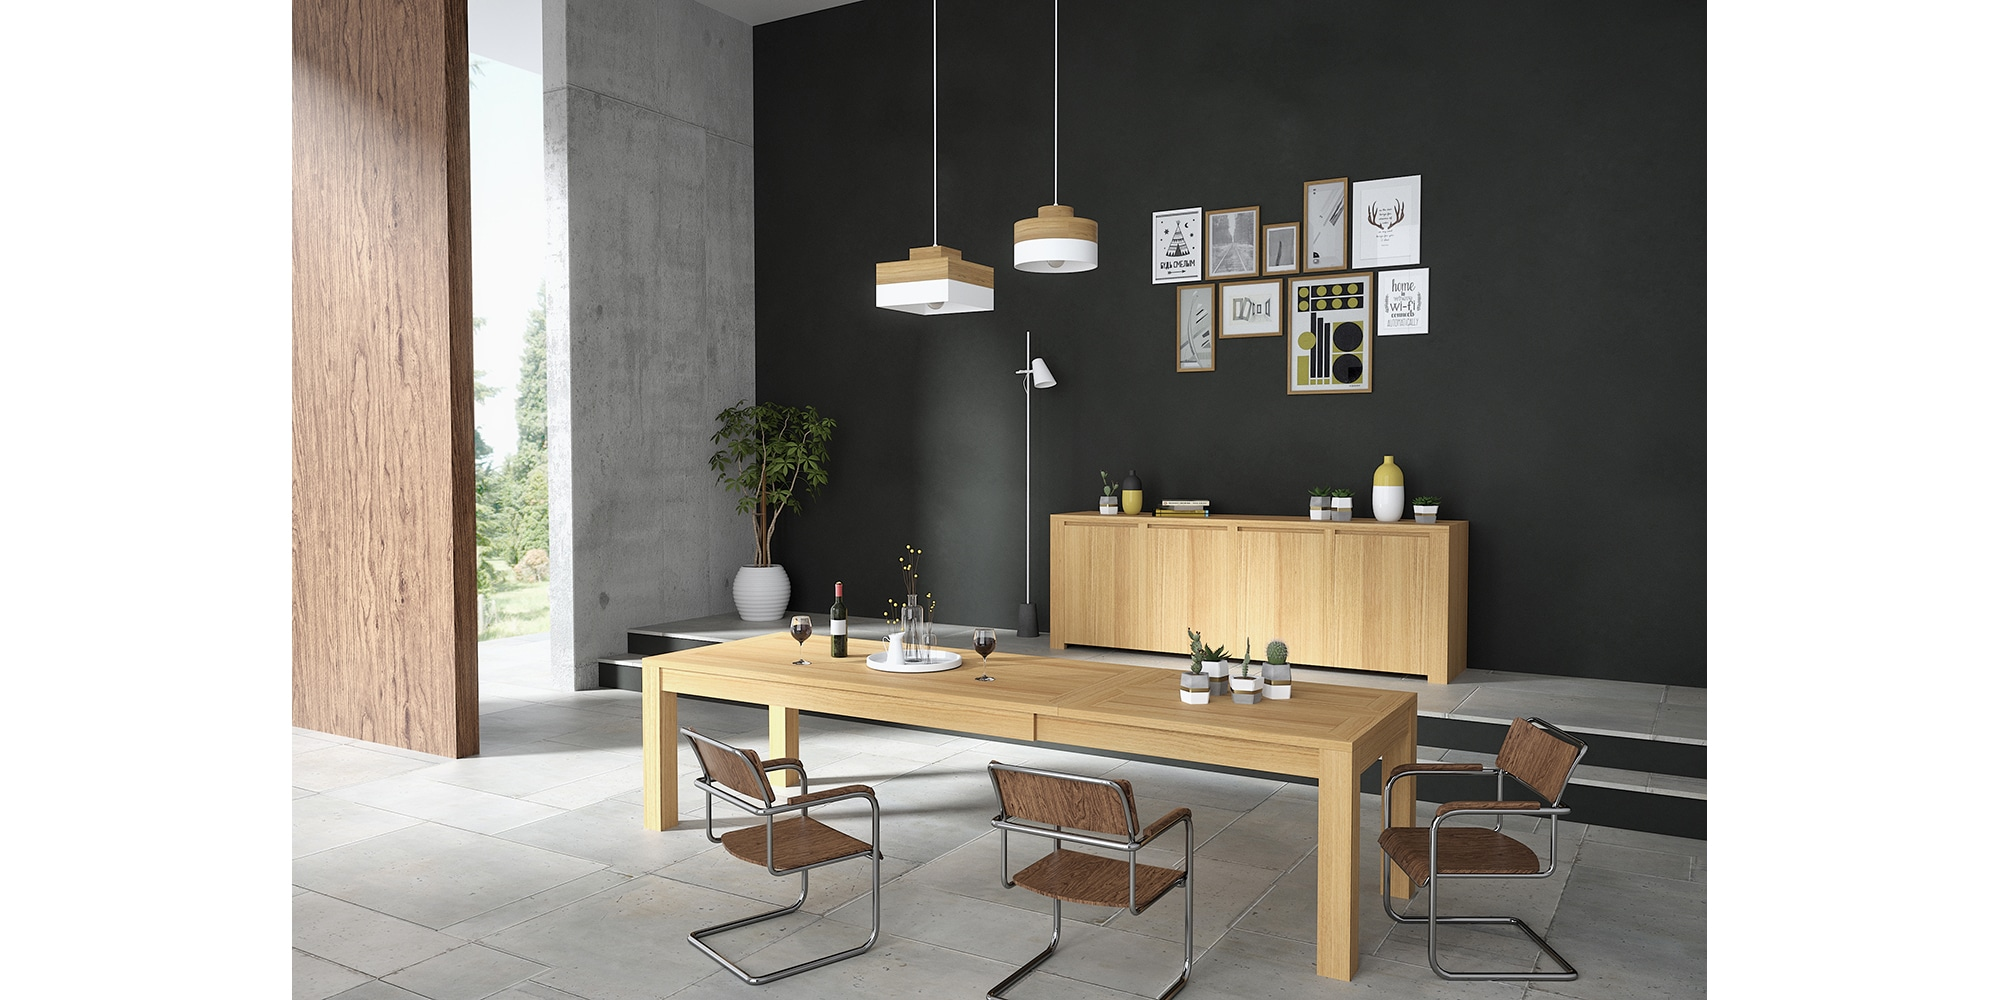 Dressoir au design moderne en bois